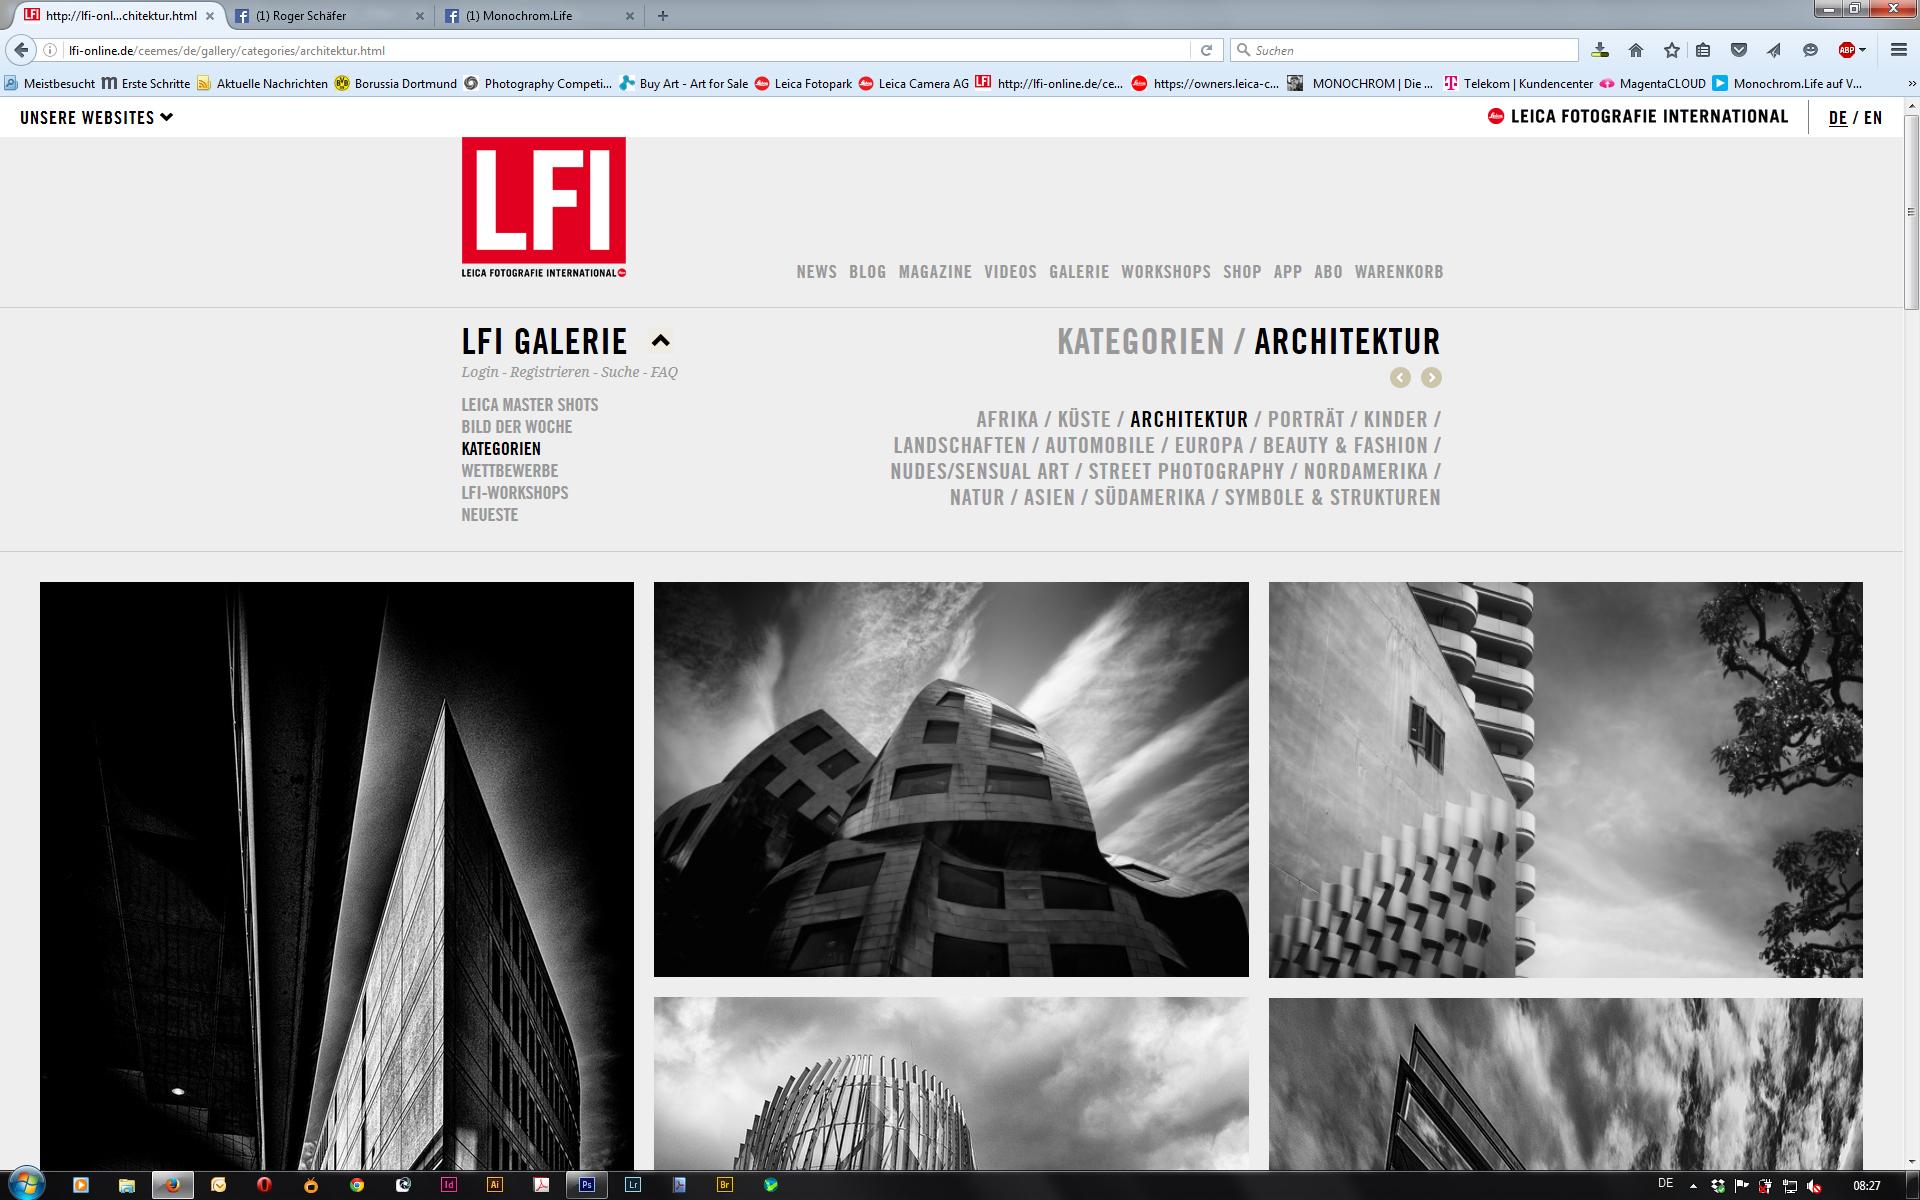 LFI_Architektur_08_2016 by .